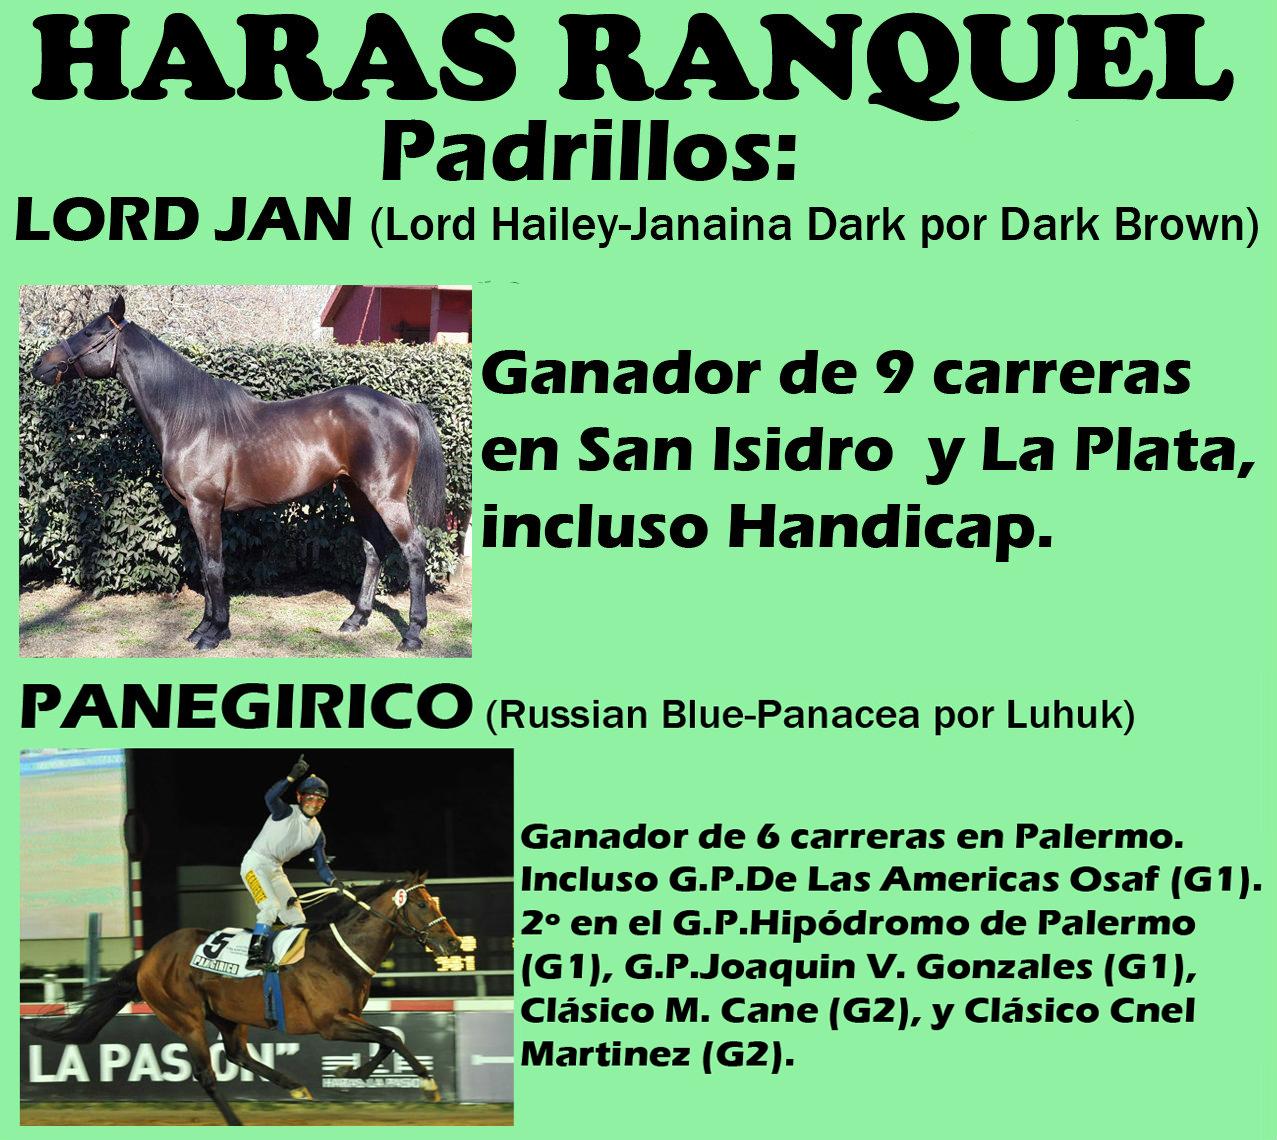 HS RANQUEL - PADRILLOS 1